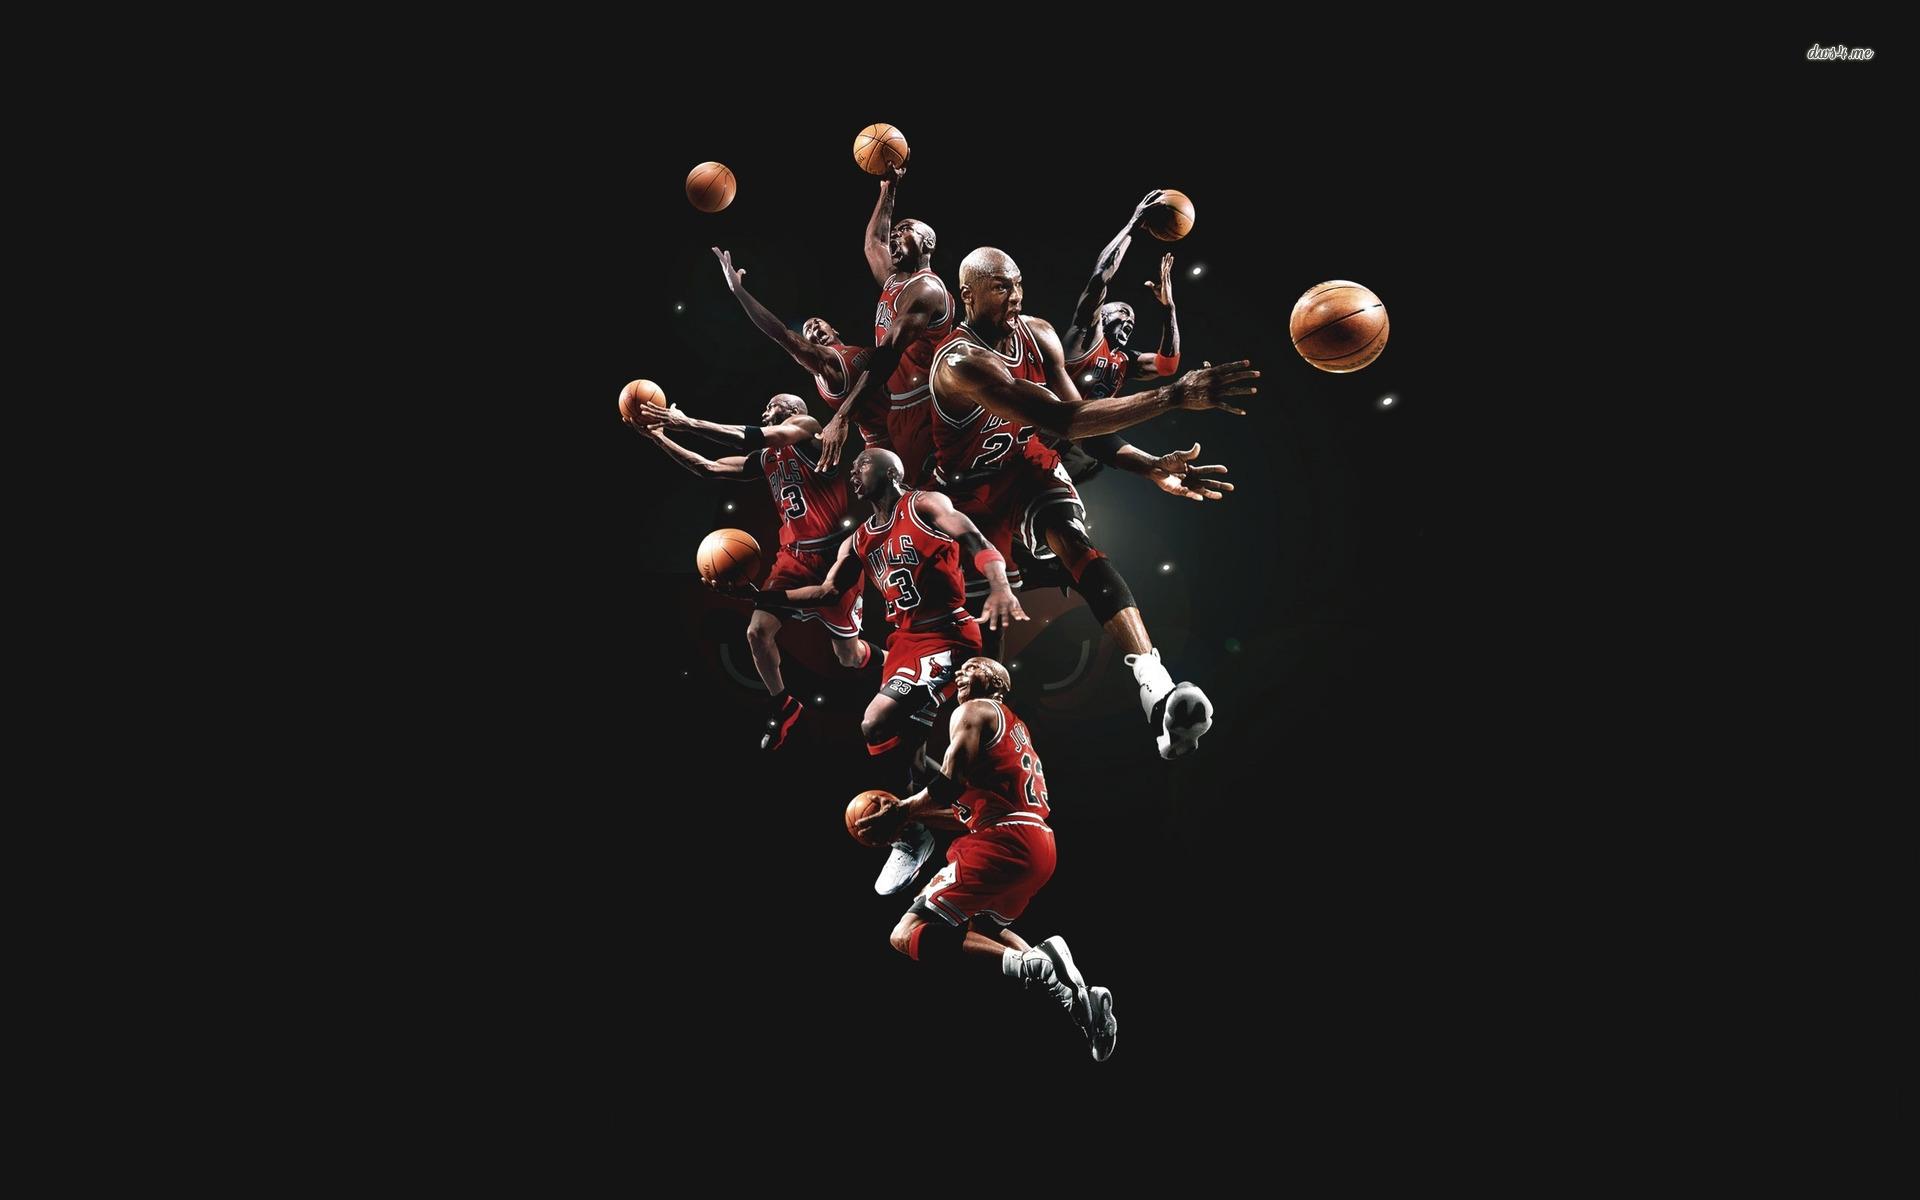 Michael Jordan Jersey Wallpaper Re Re 1920x1200